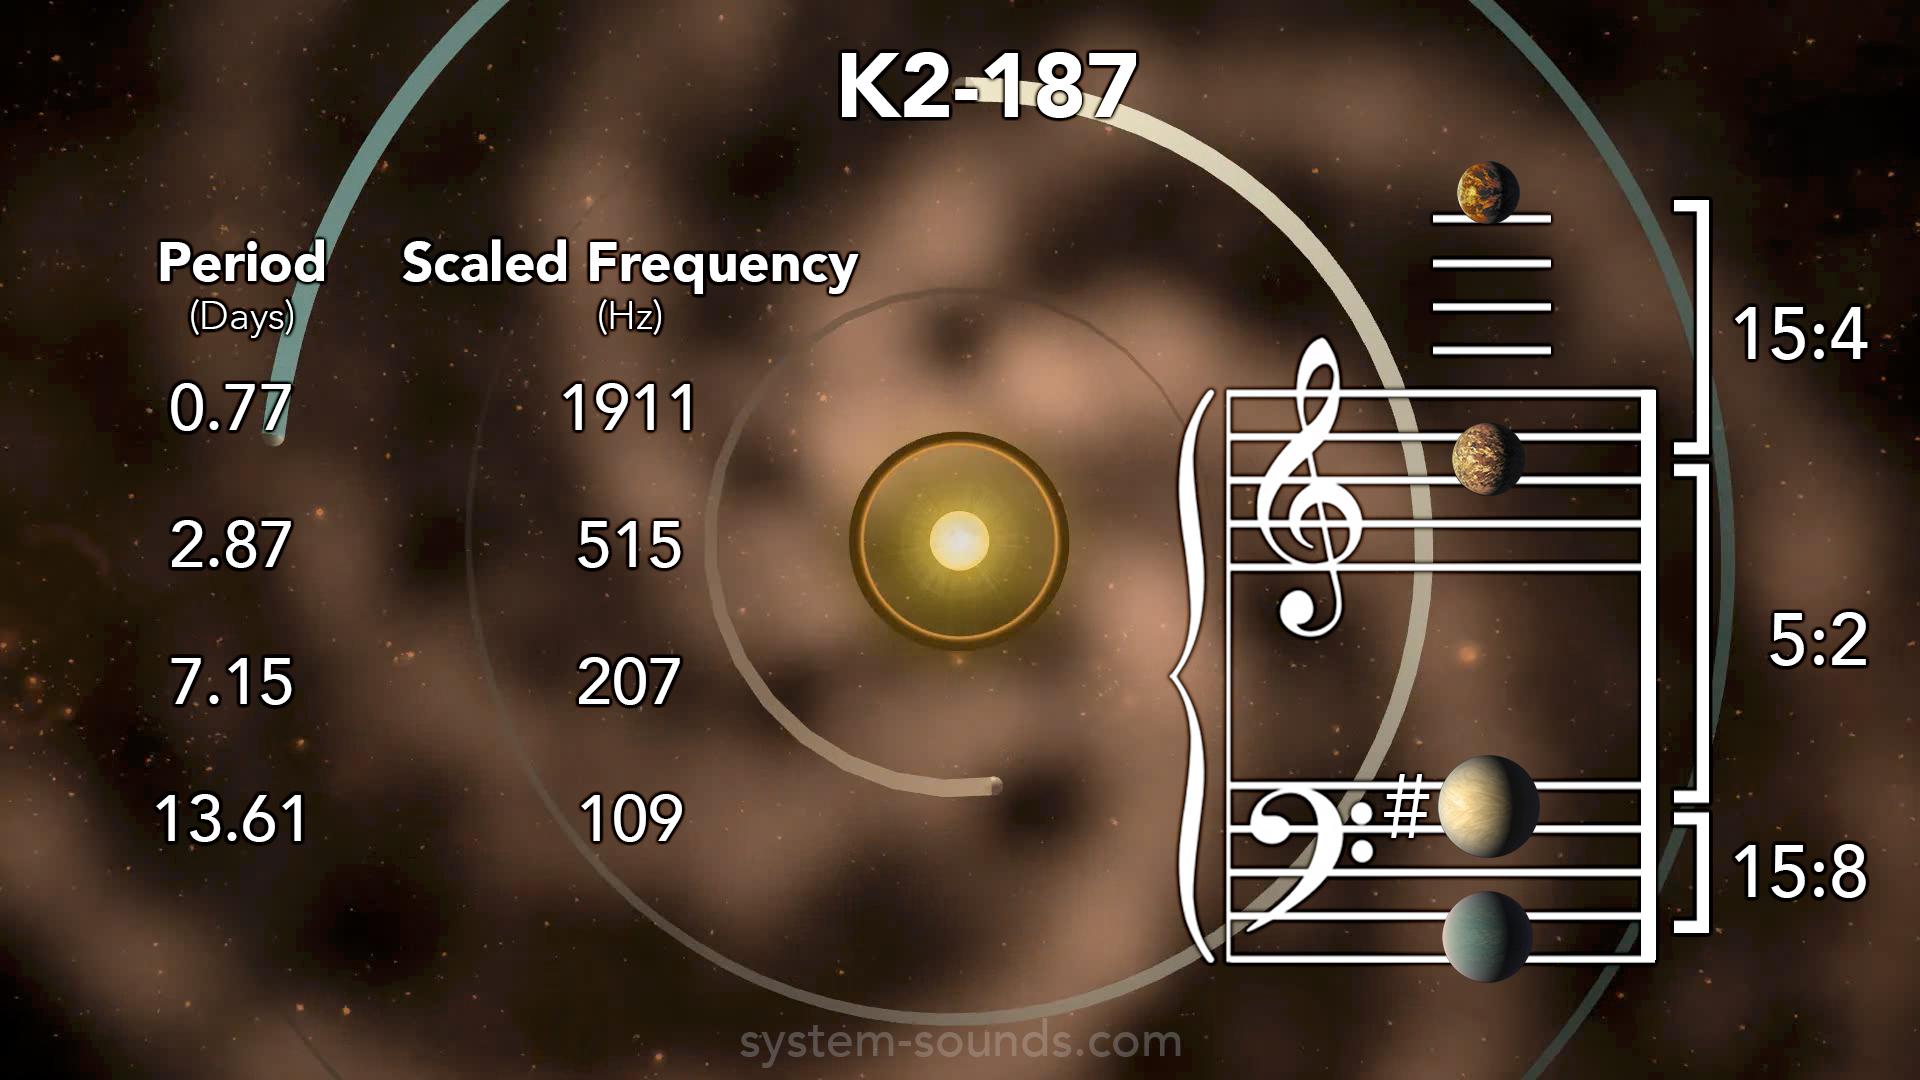 K2-187